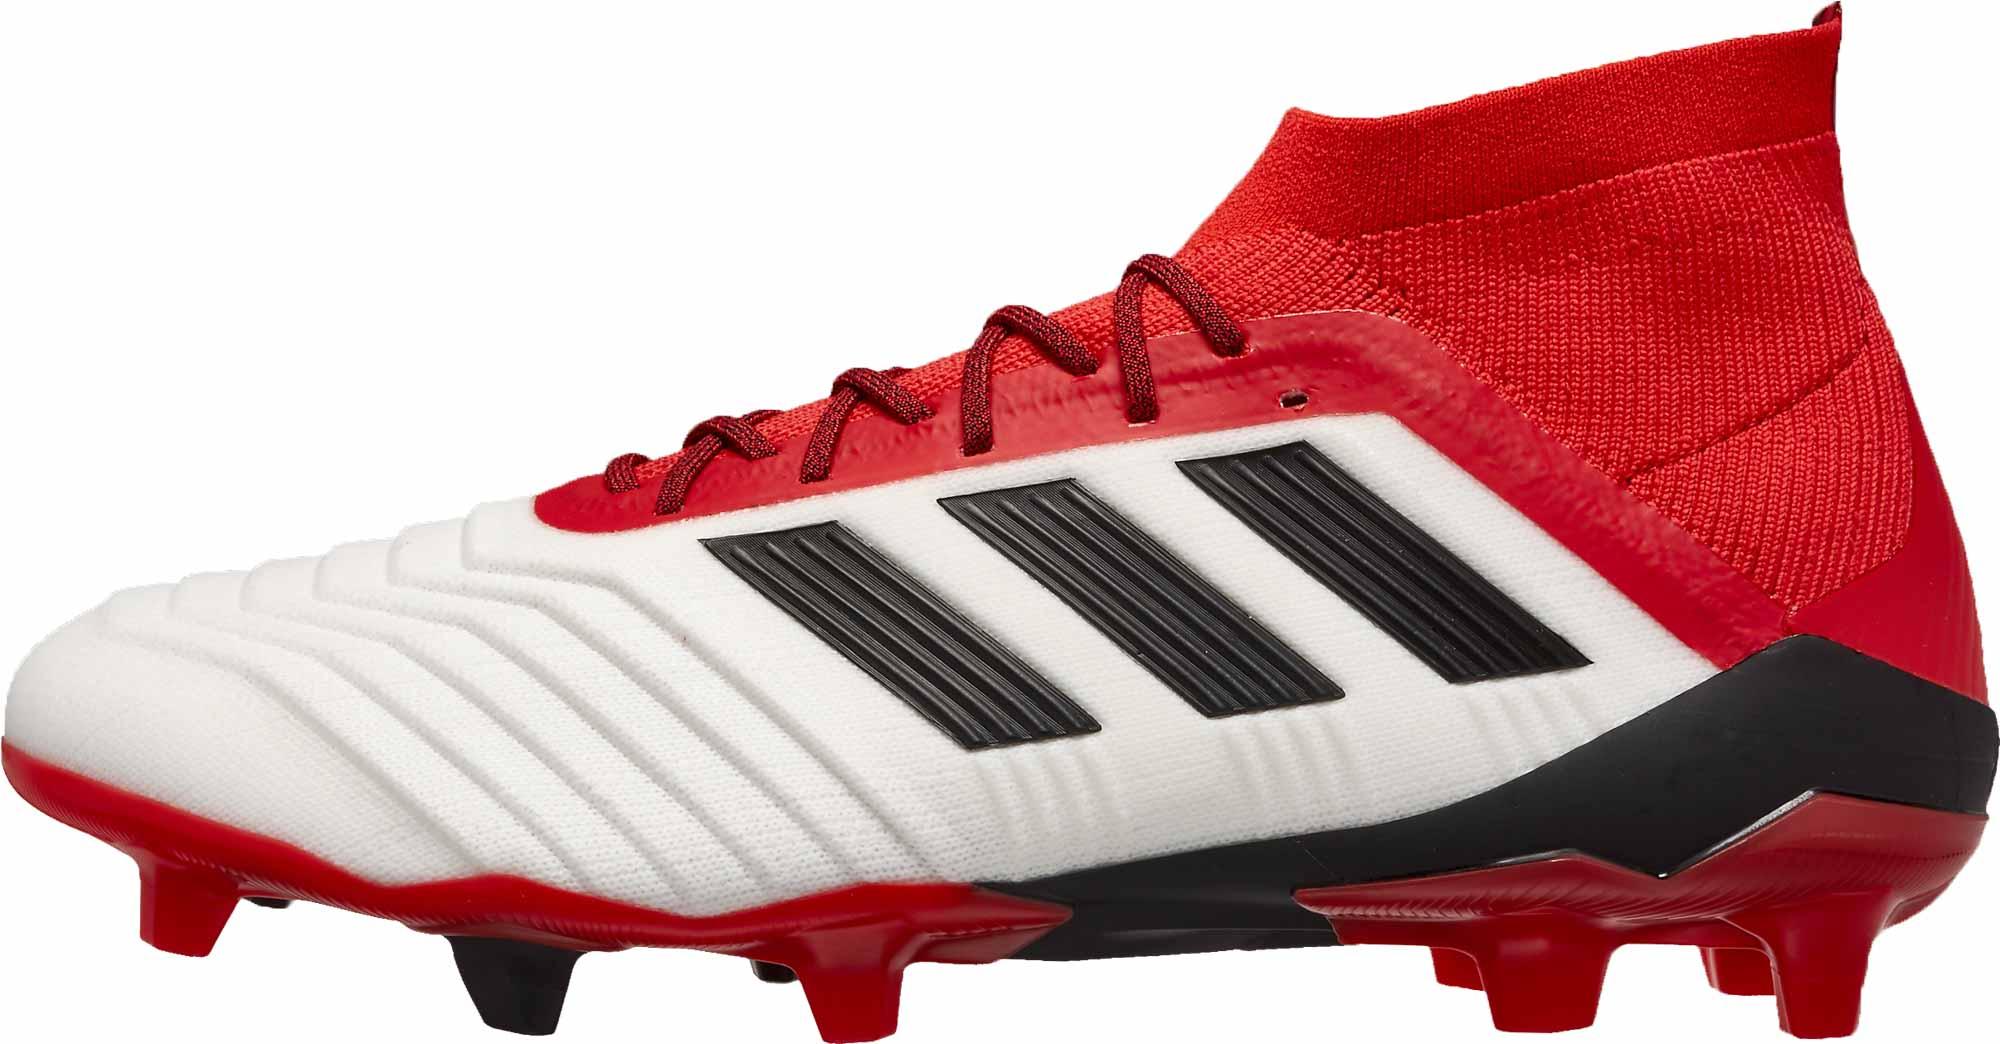 27f4078b7 adidas Predator 18.1 FG - White   Real Coral - Soccer Master